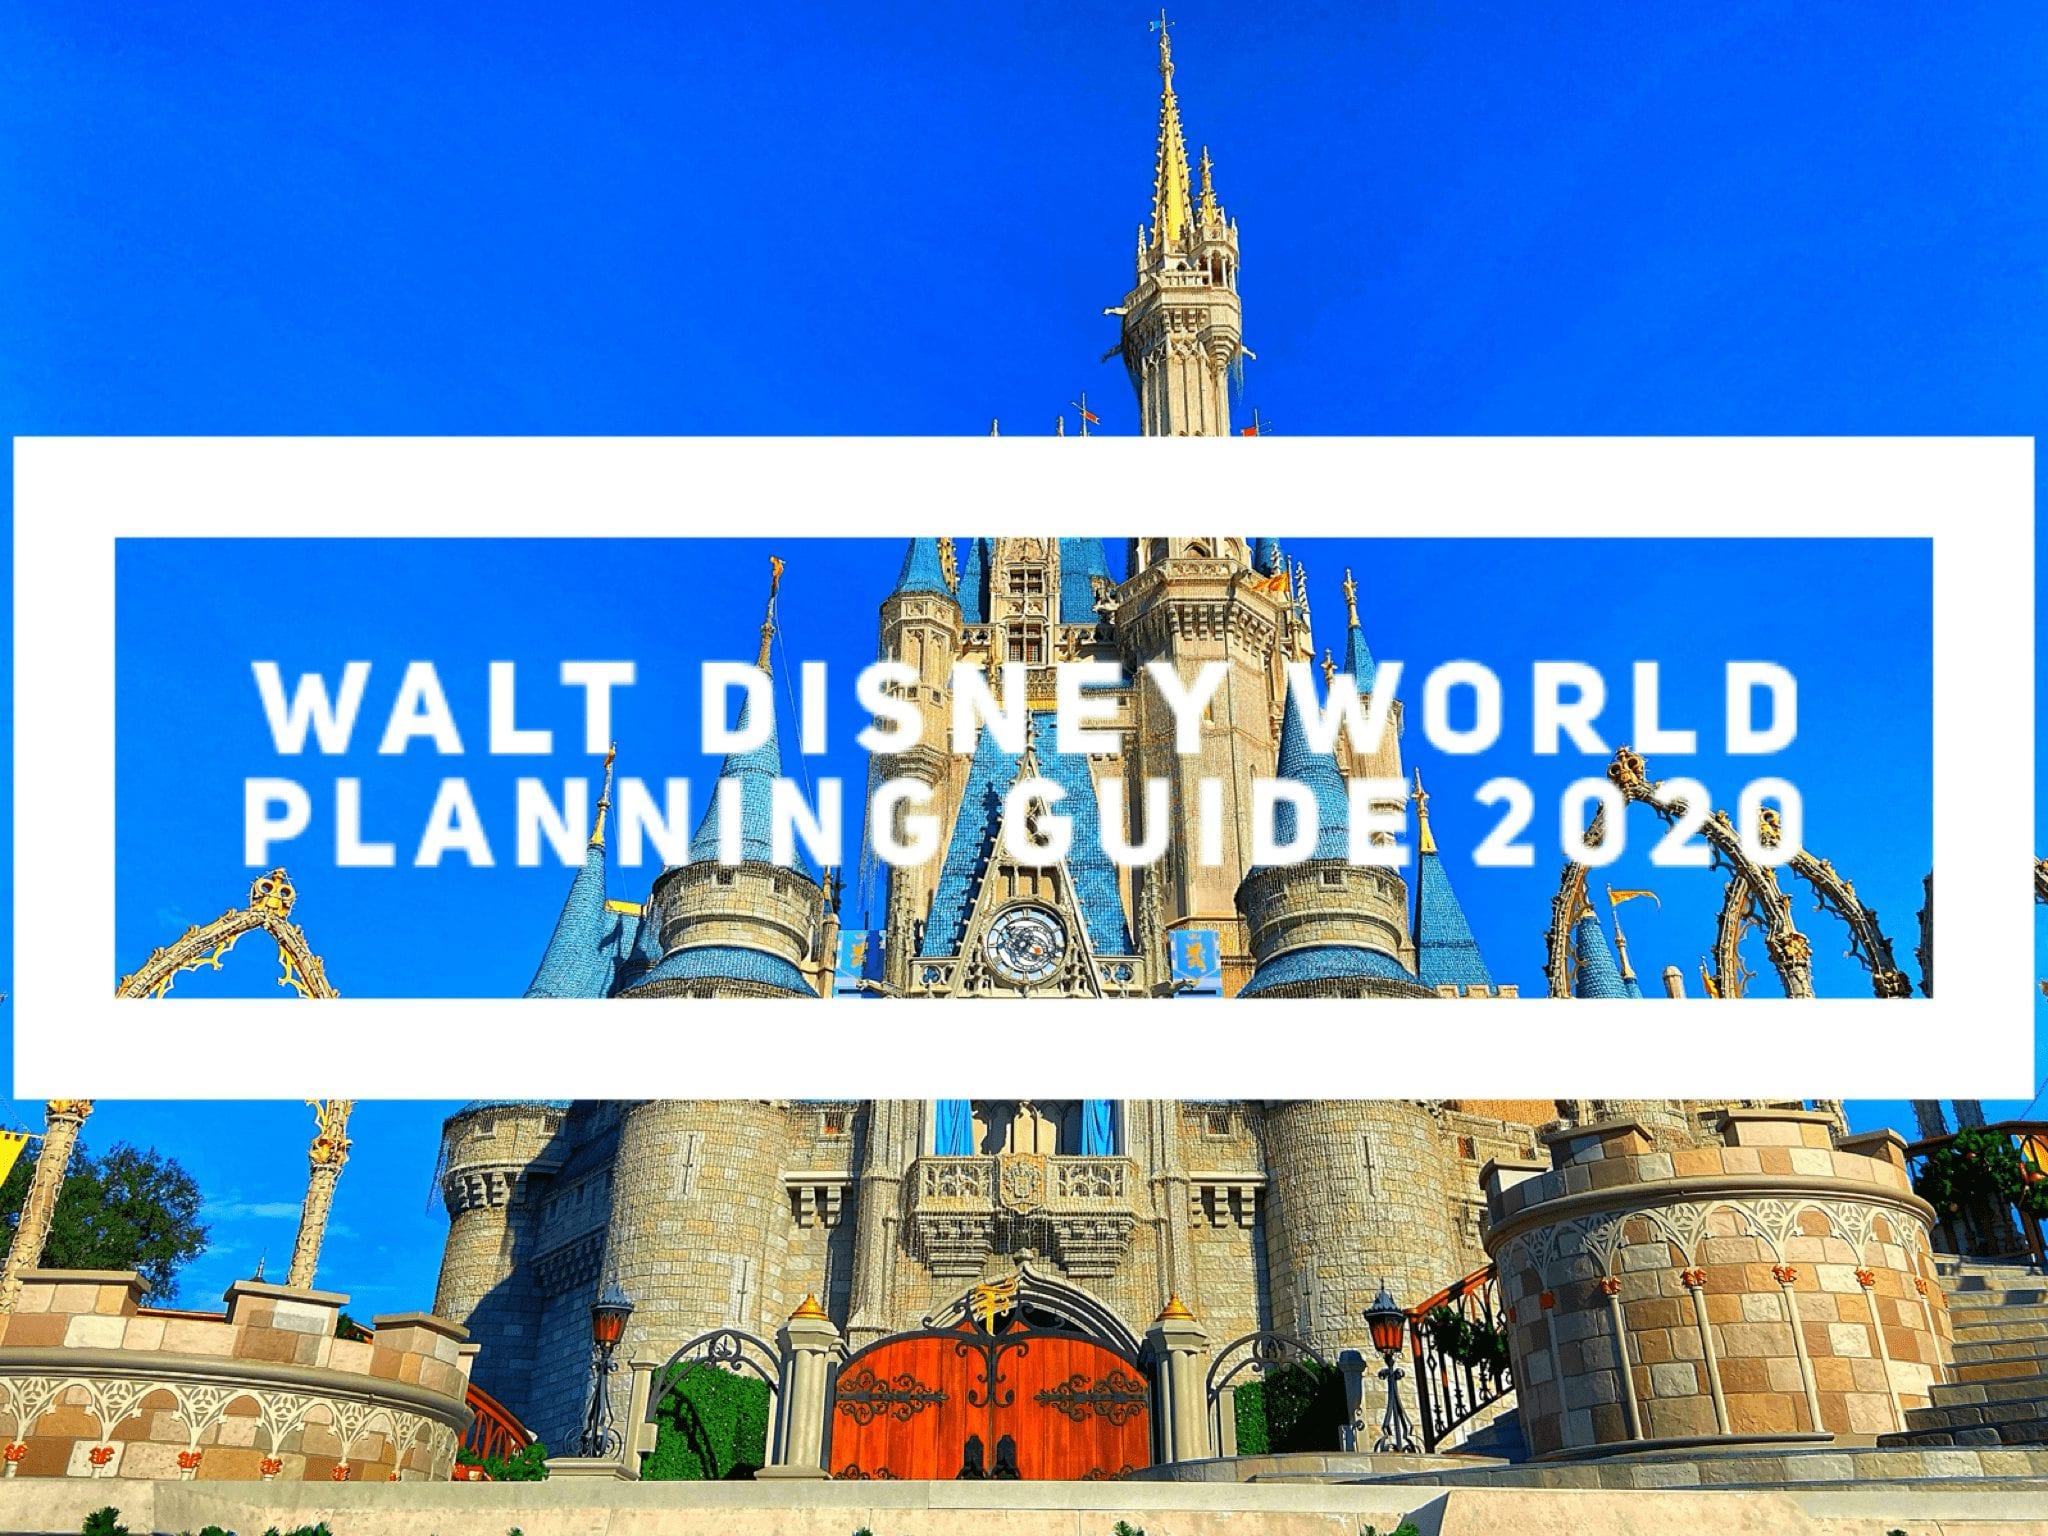 Walt Disney World Planning Guide 2020